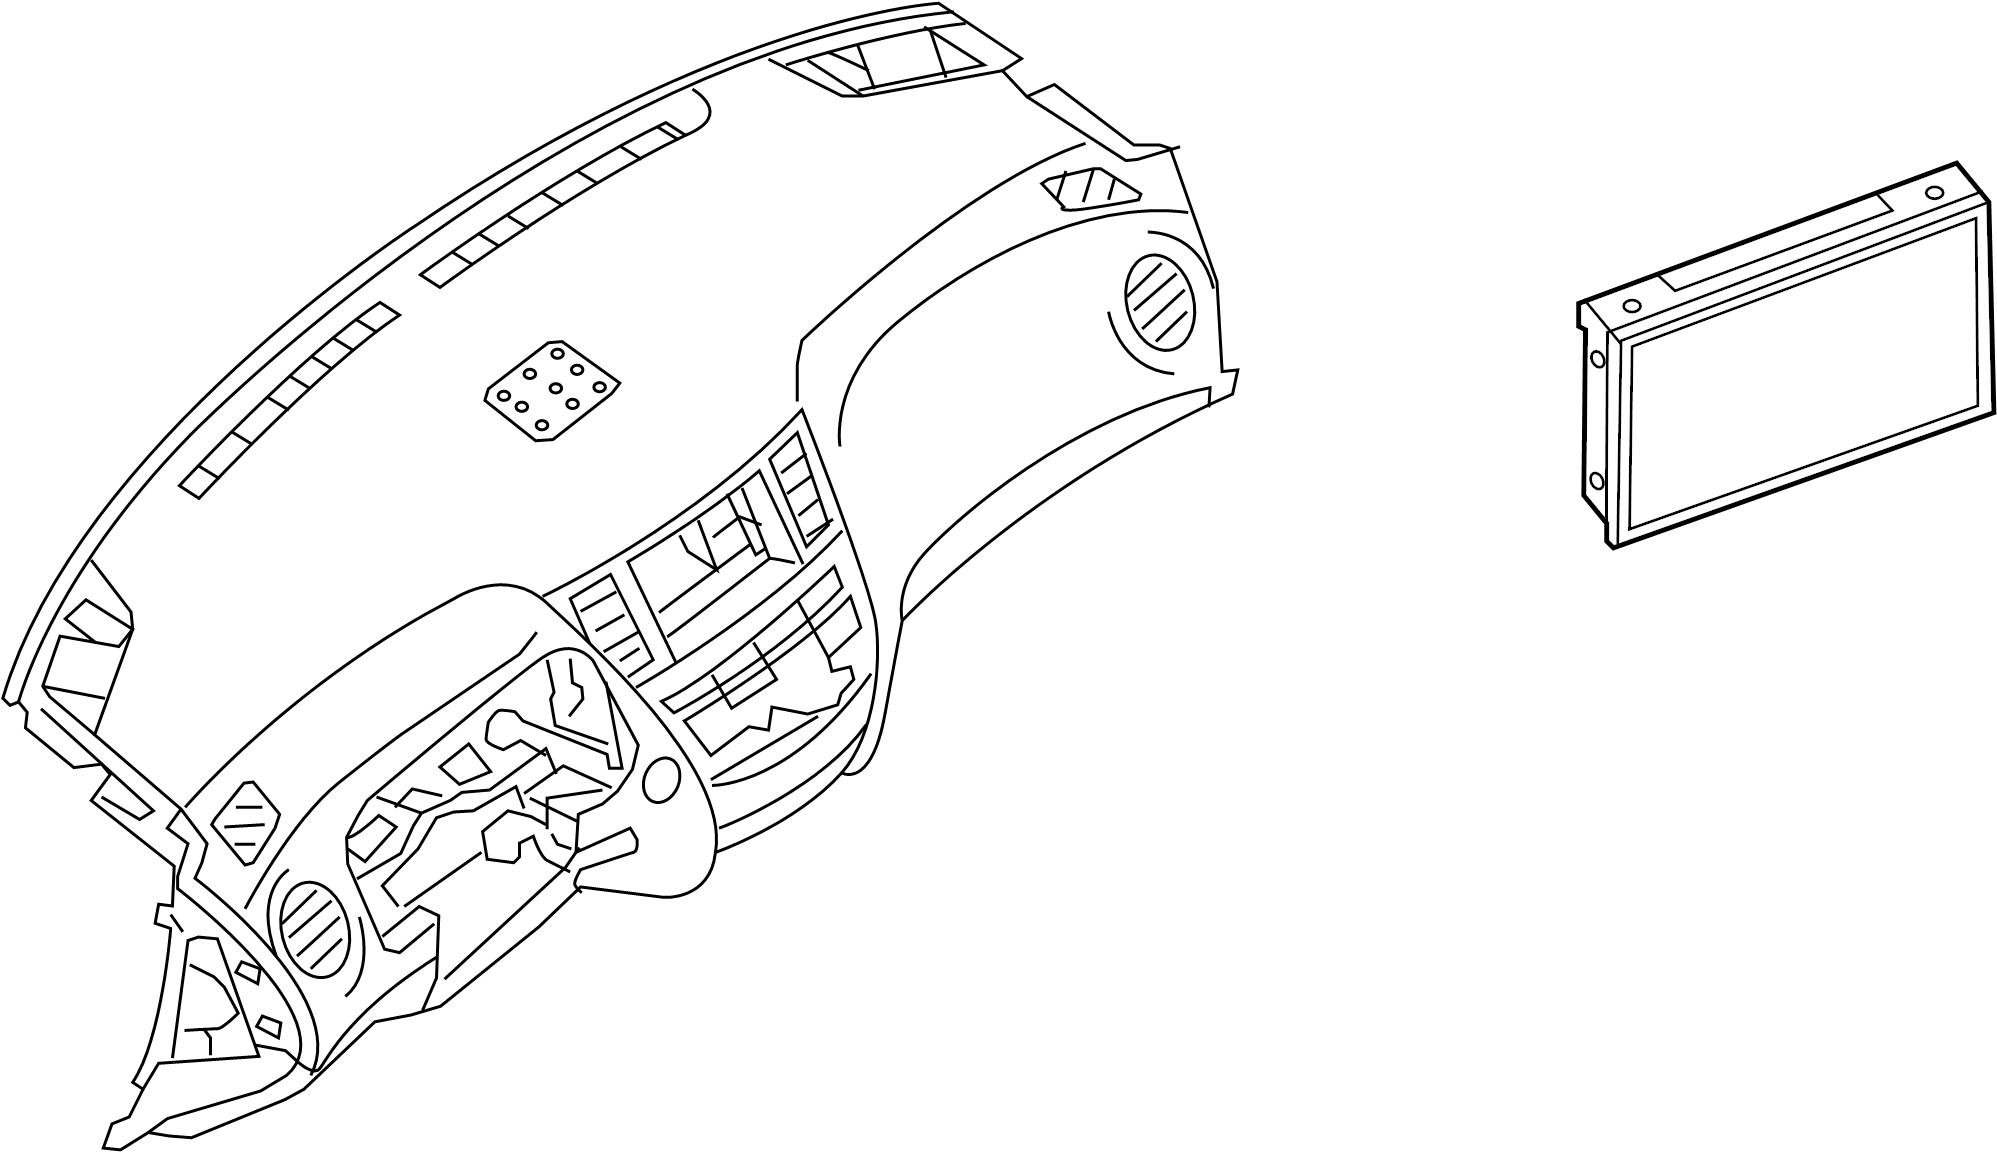 Nissan Pathfinder Gps navigation system. Audio, unit